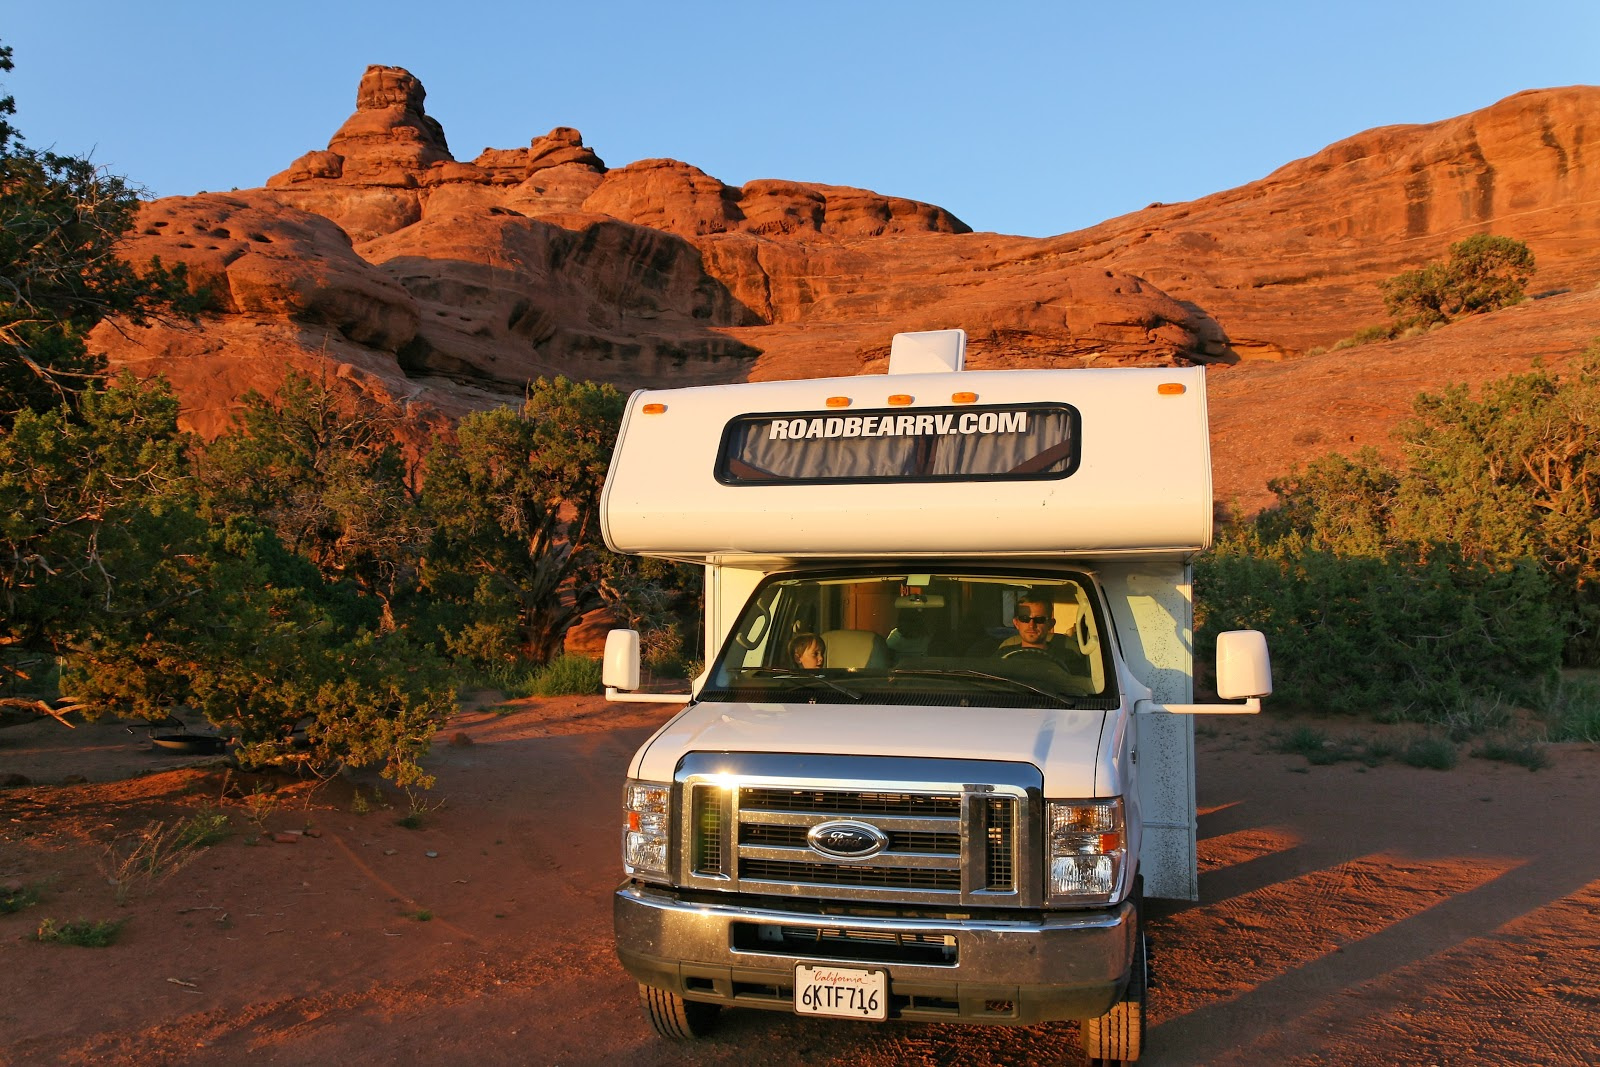 conseils de voyage o louer son camping car rv. Black Bedroom Furniture Sets. Home Design Ideas